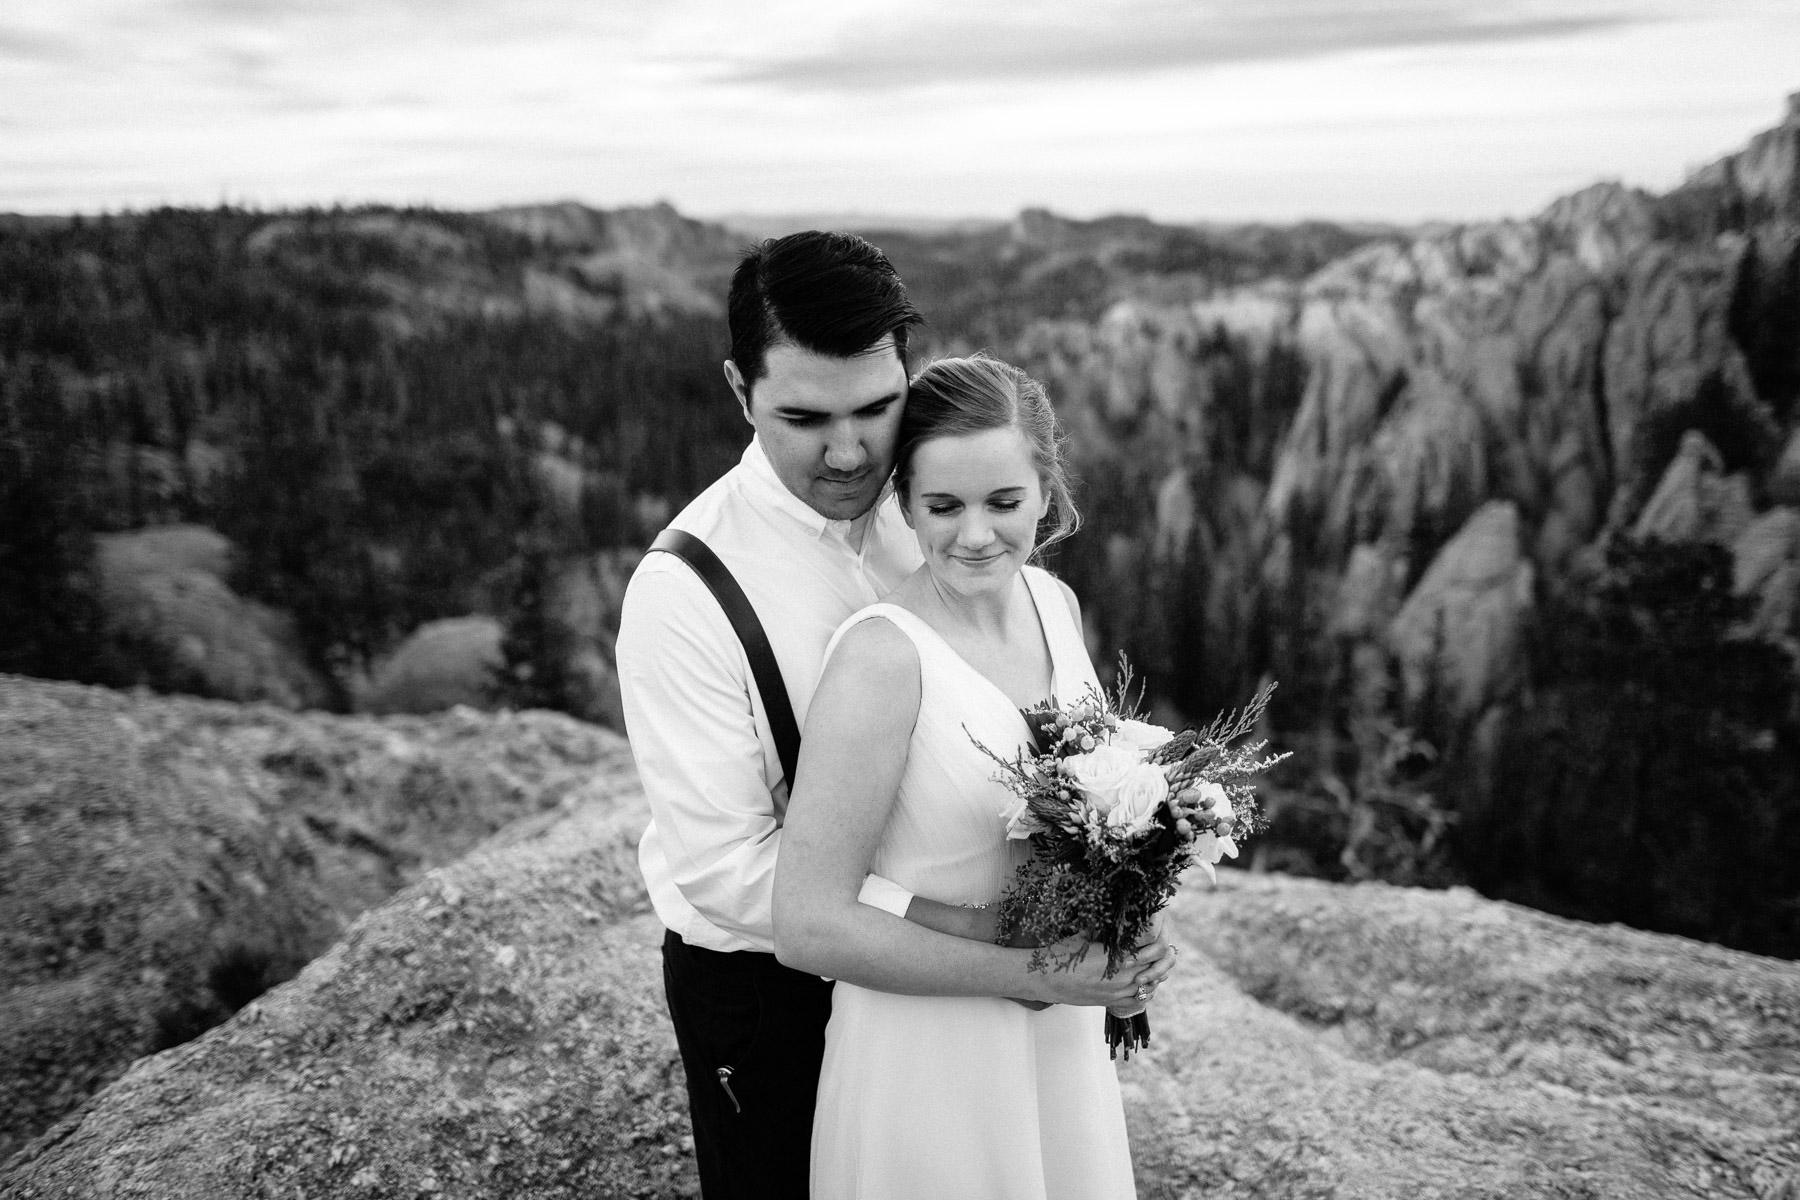 sioux-falls-black-hills-rapid-city-elopement-wedding-adventure-photographer-custer-sylvan-lake-49.jpg